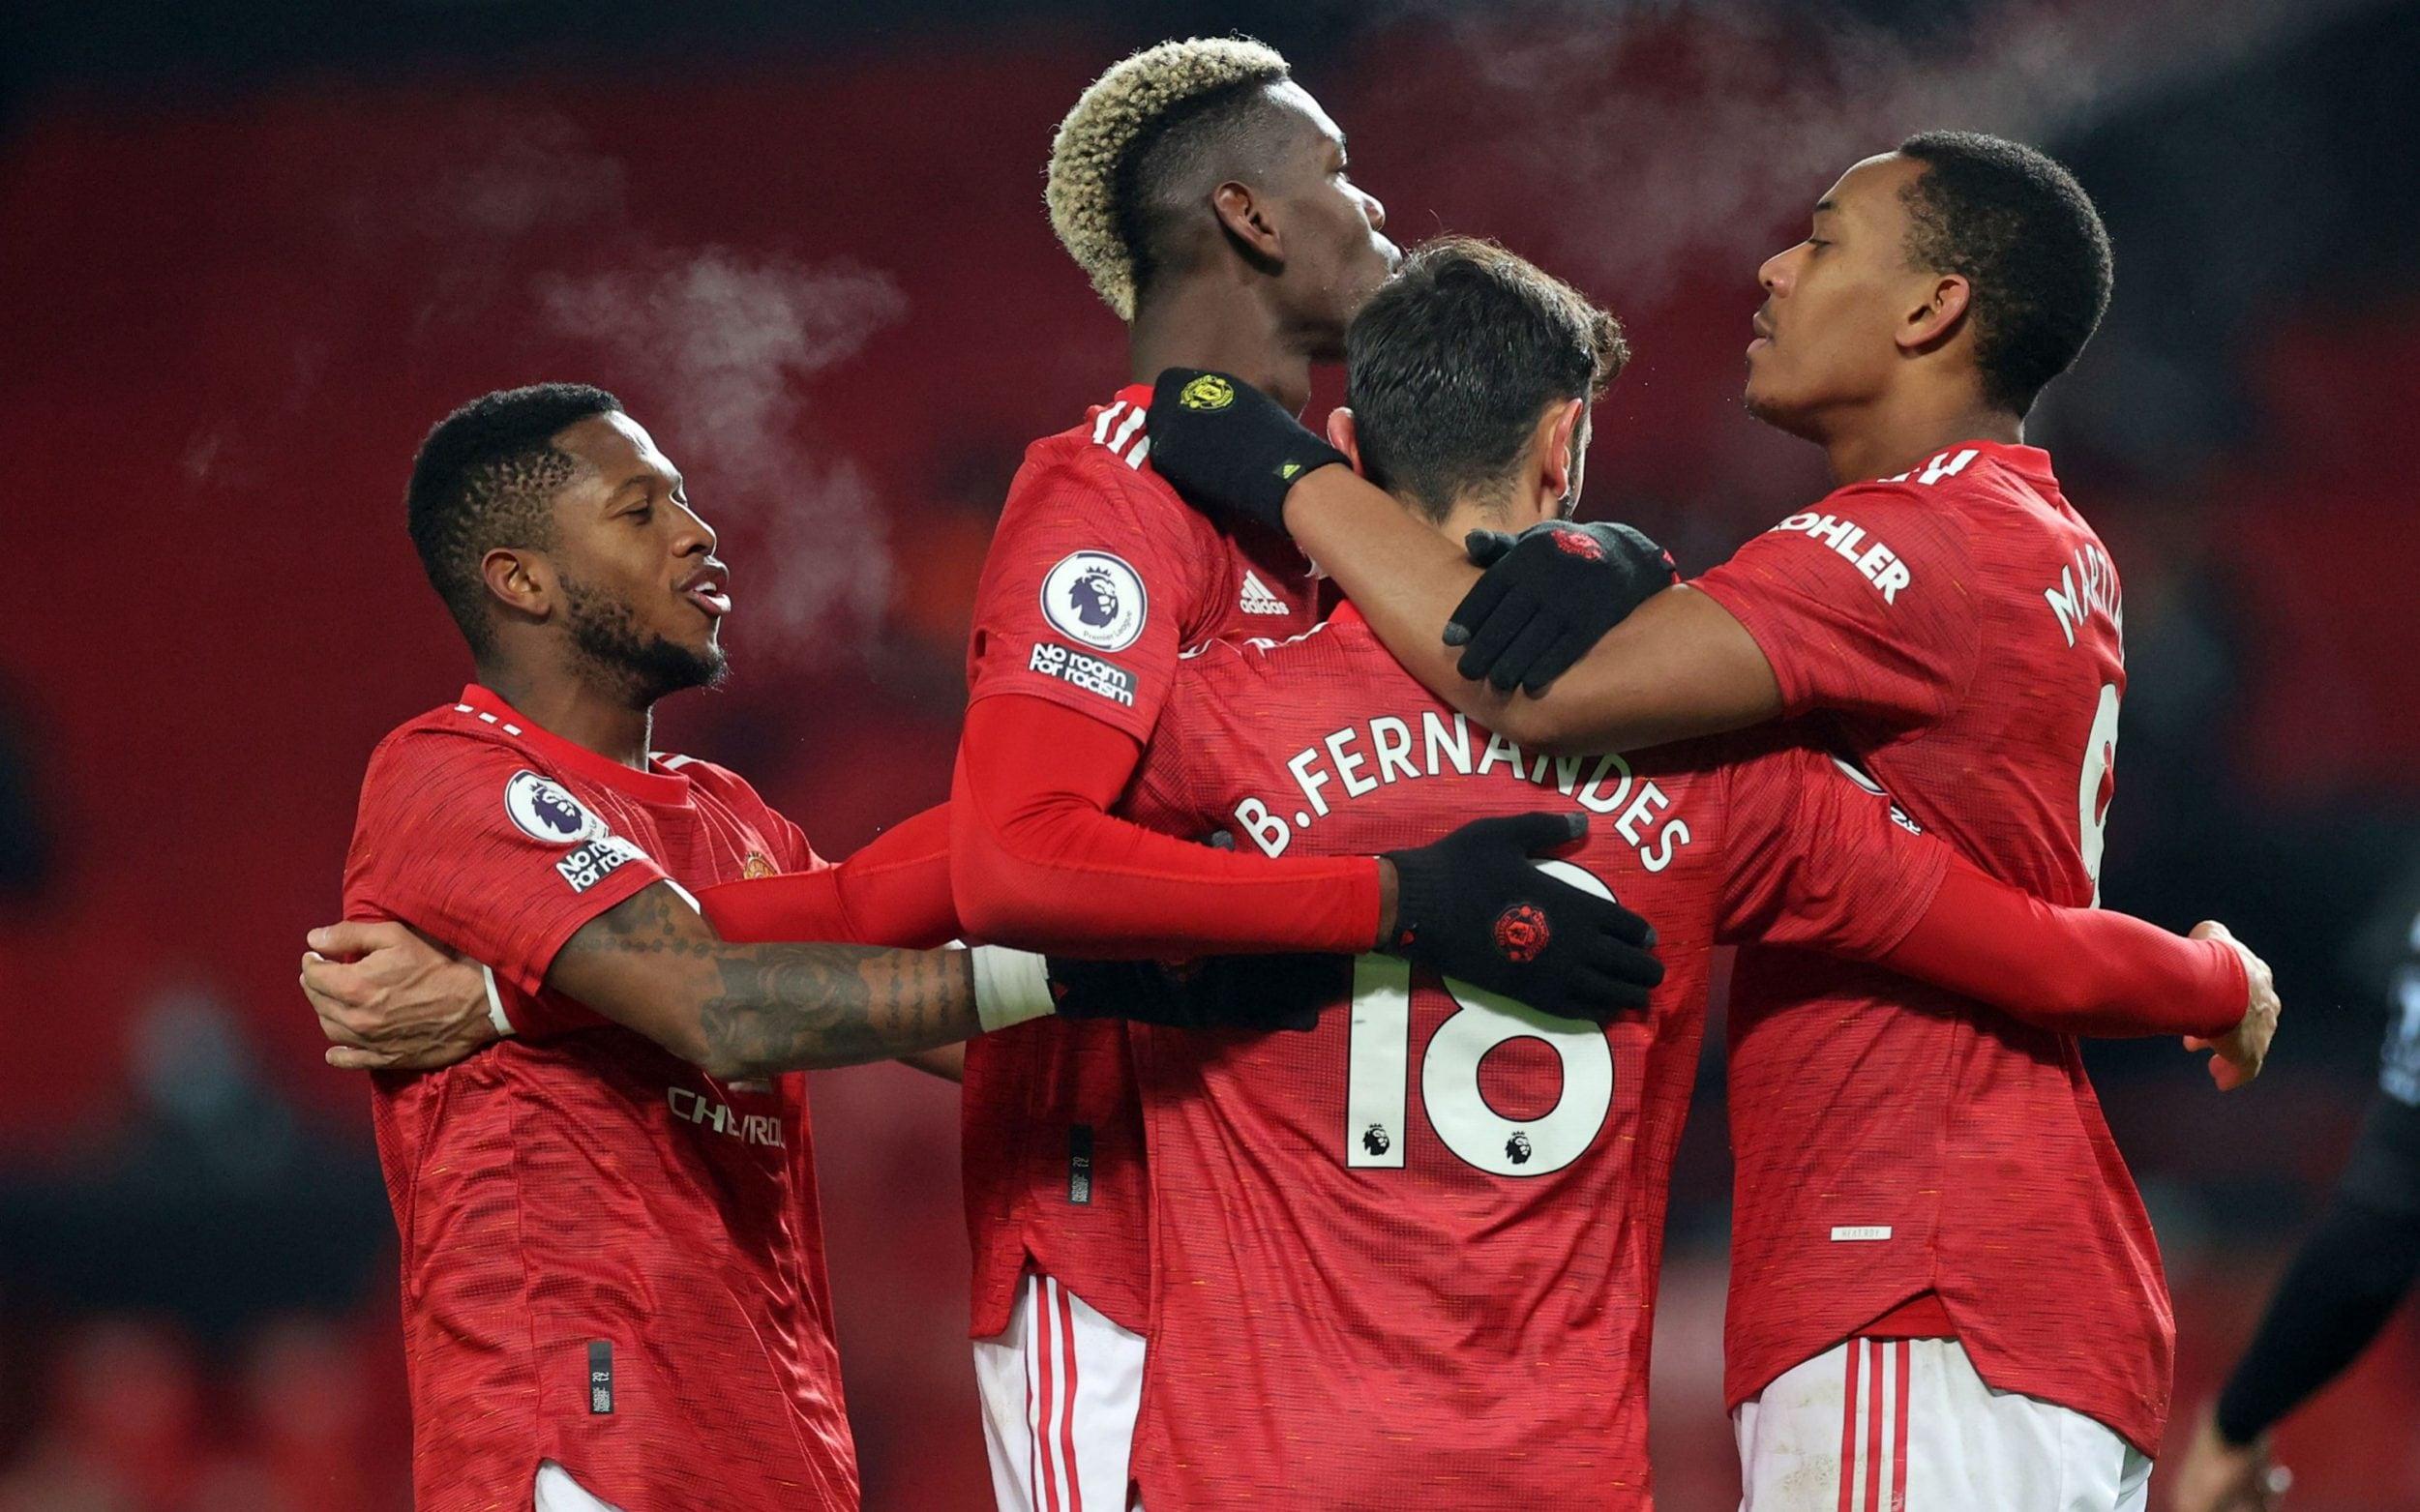 Manchester United have finally found their new Roy Keane says former team-mate - Bóng Đá